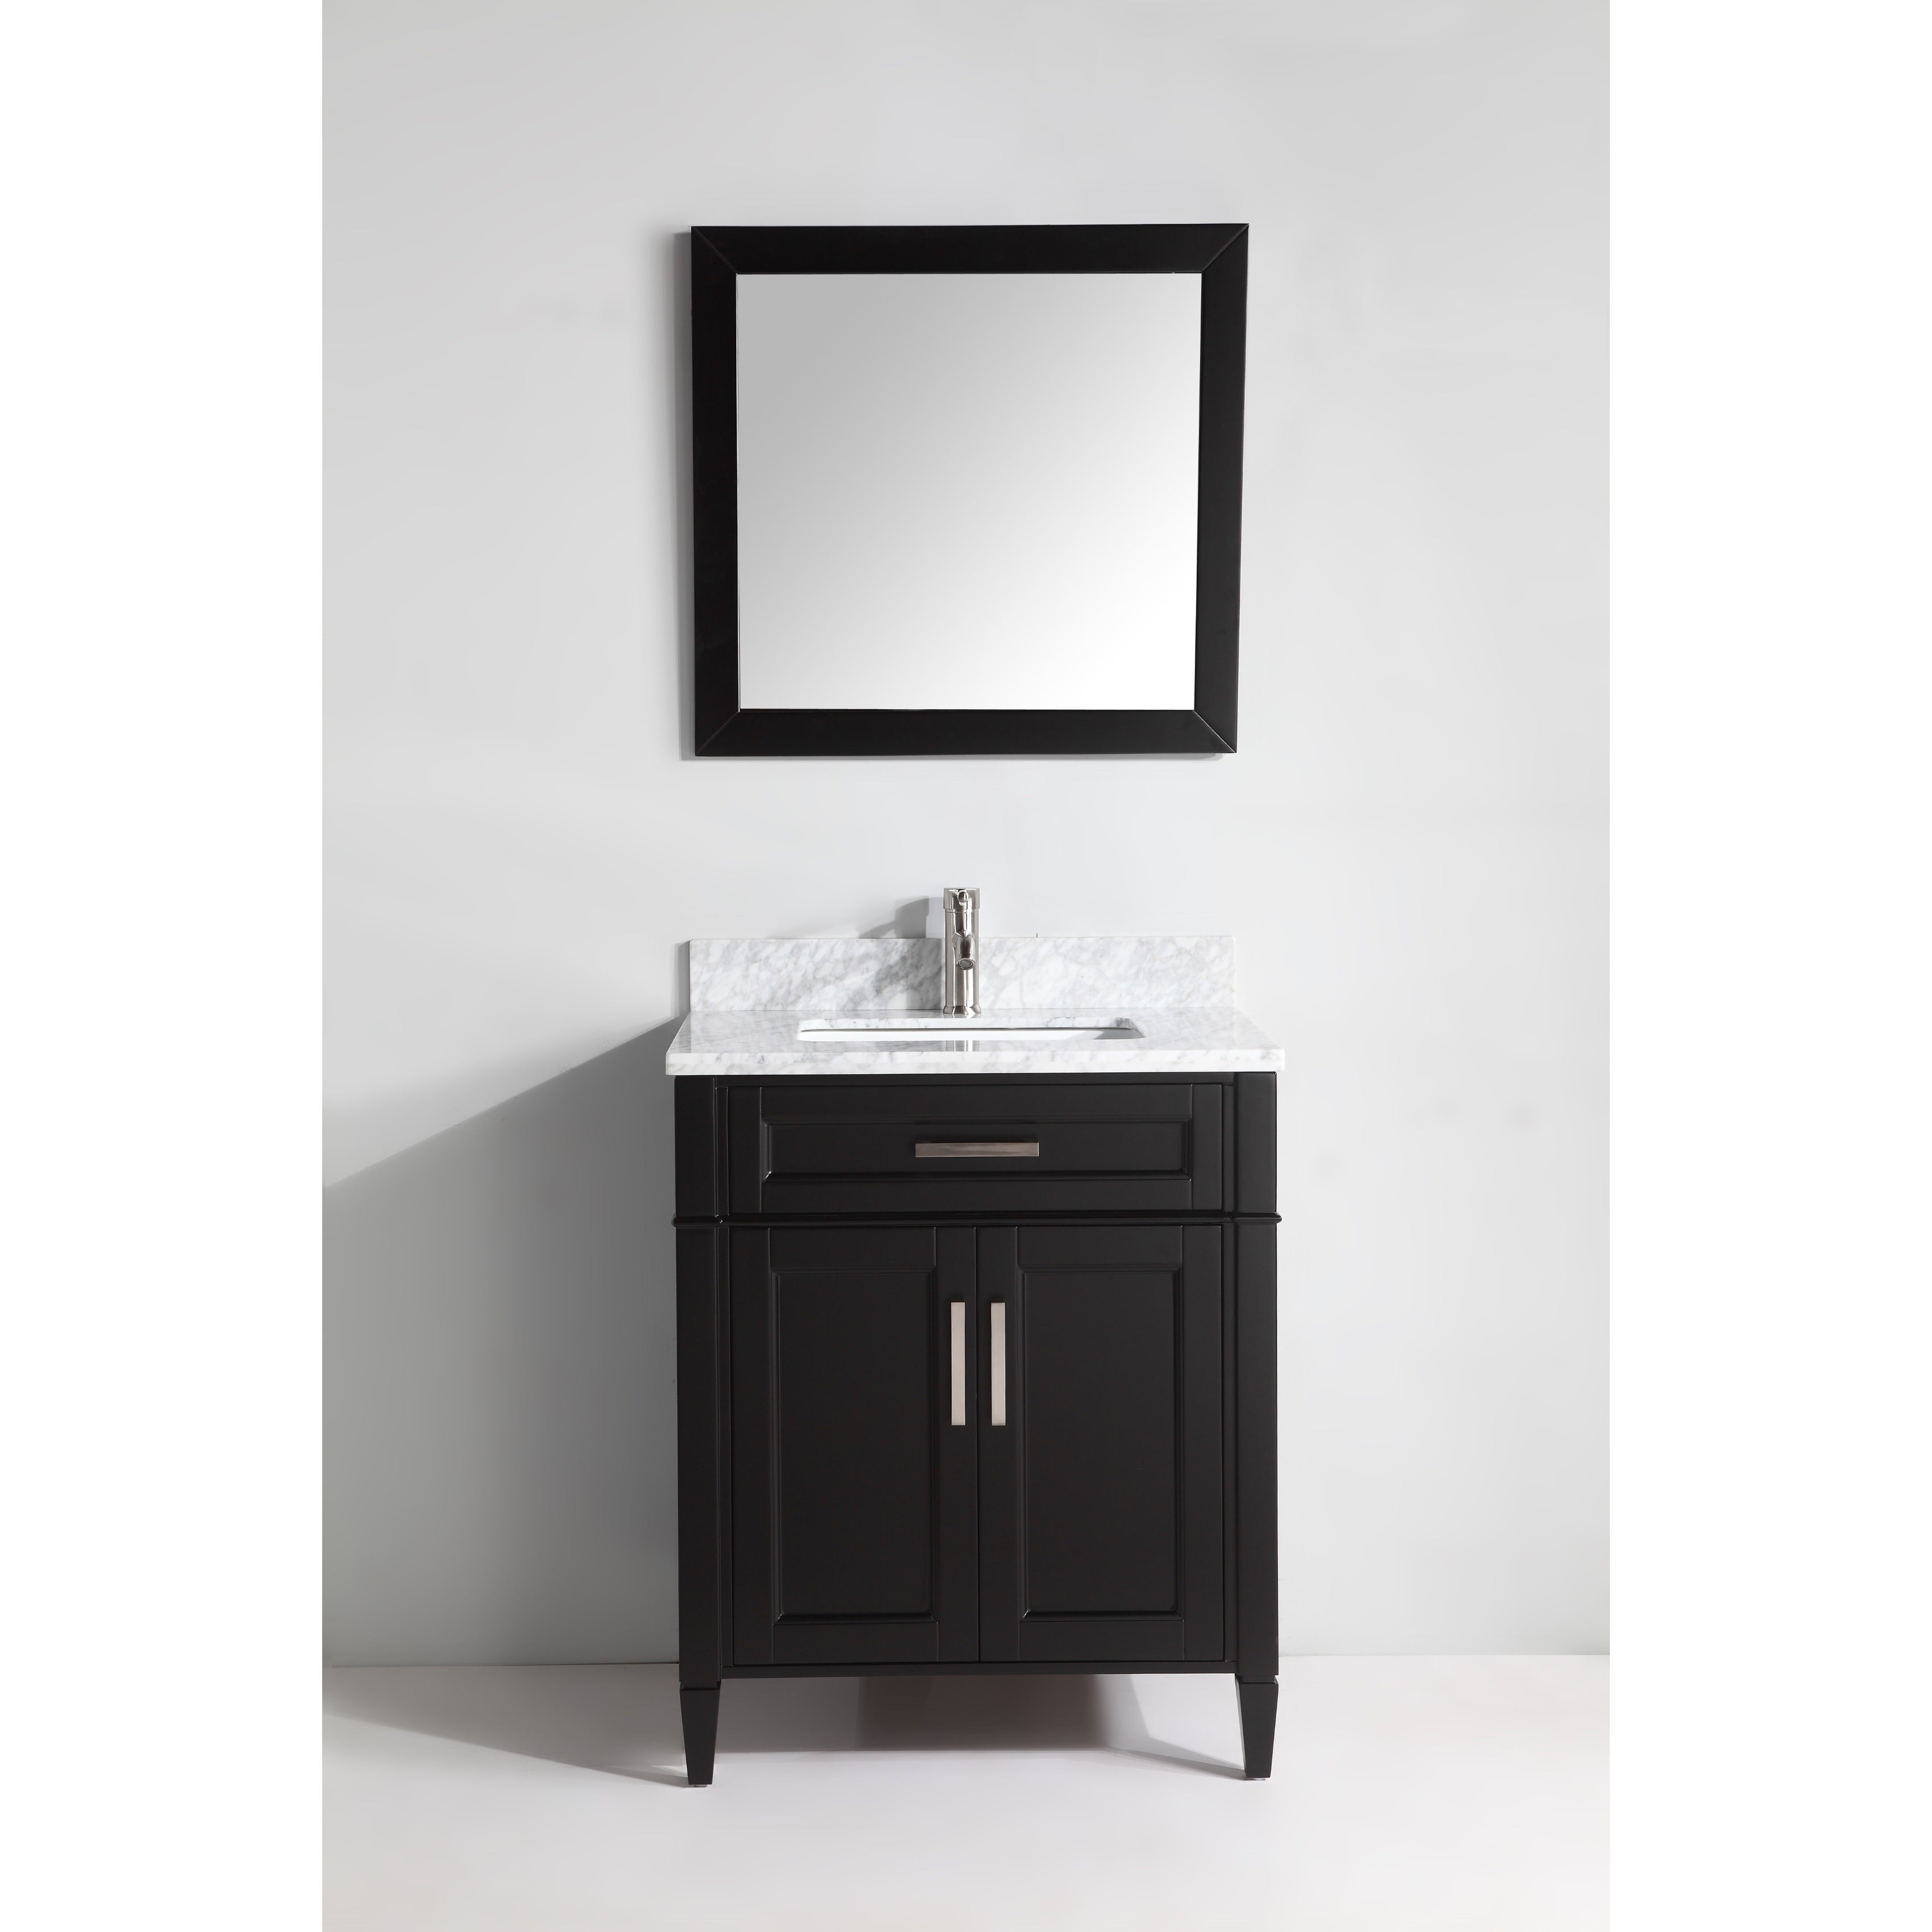 Vanity-Art-30-inch-Bathroom-Vanity-Set-with-